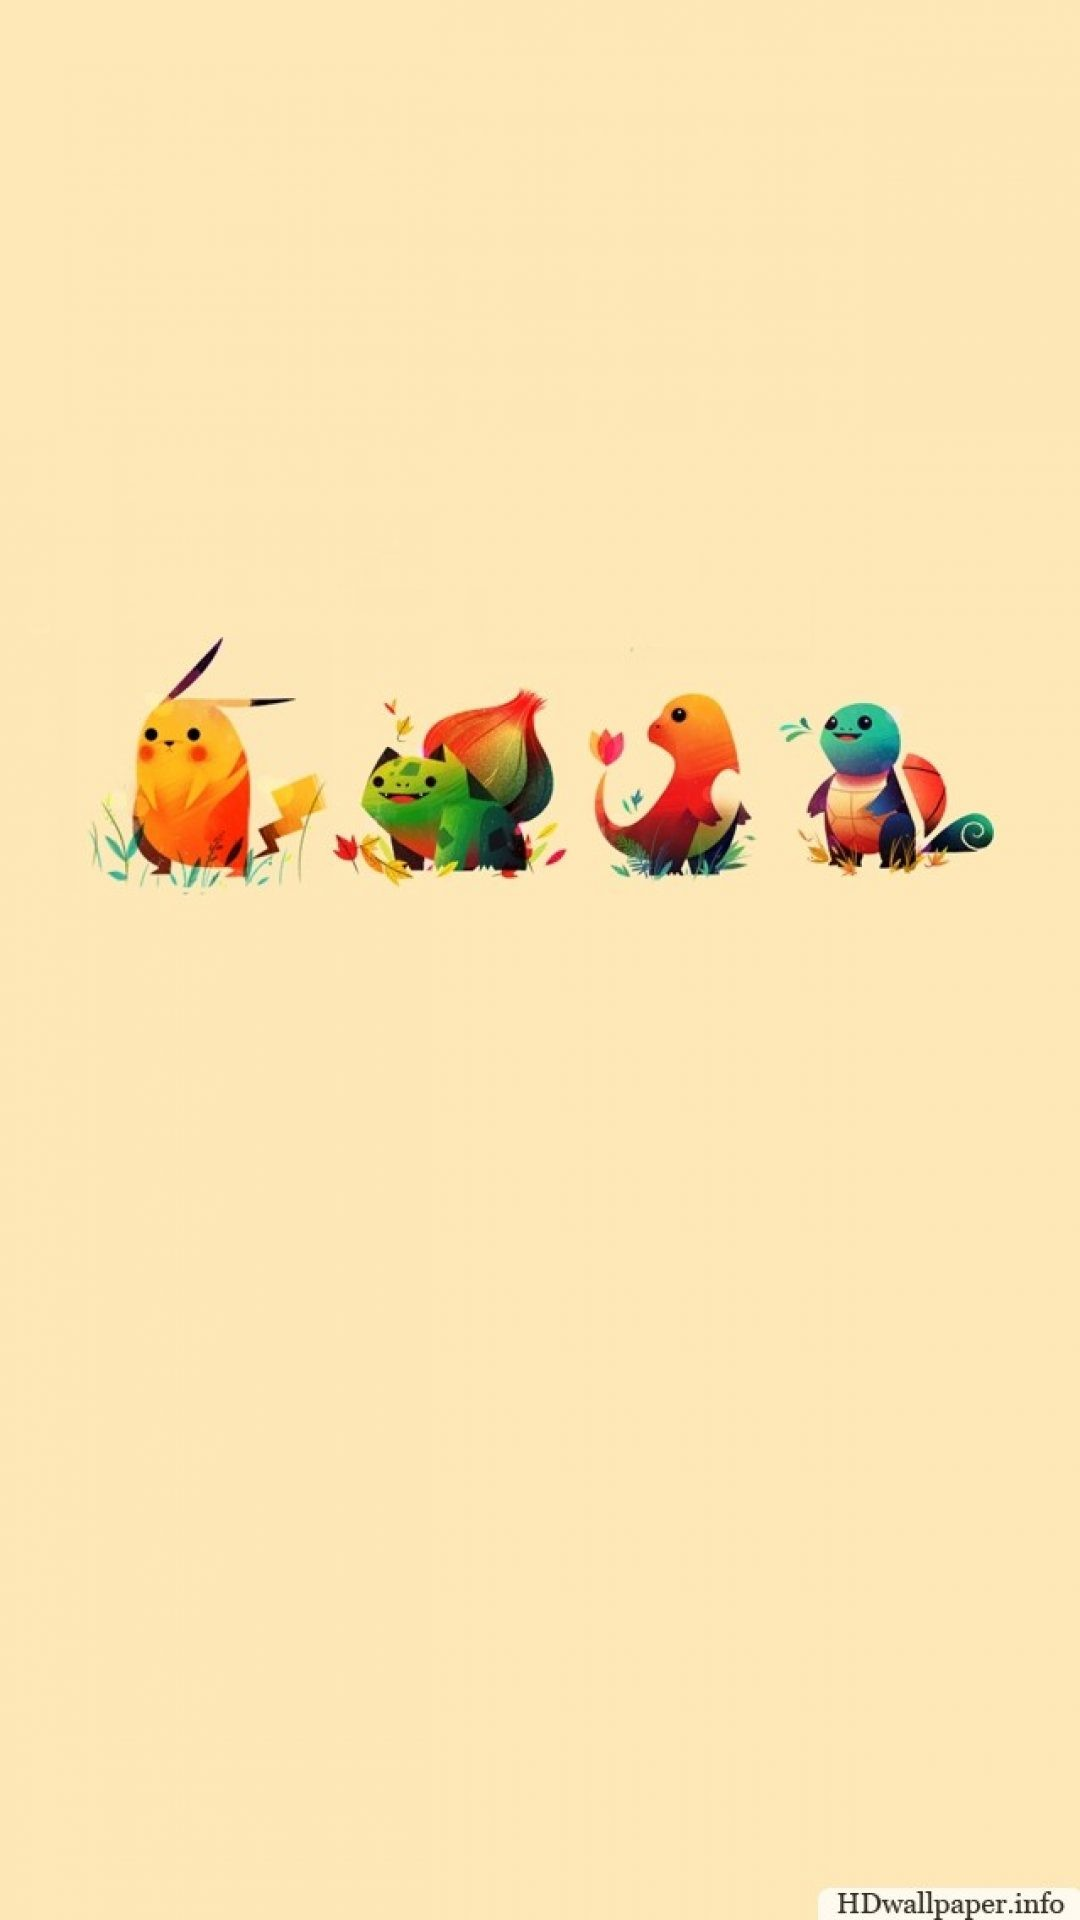 pokemon iphone wallpaper hd